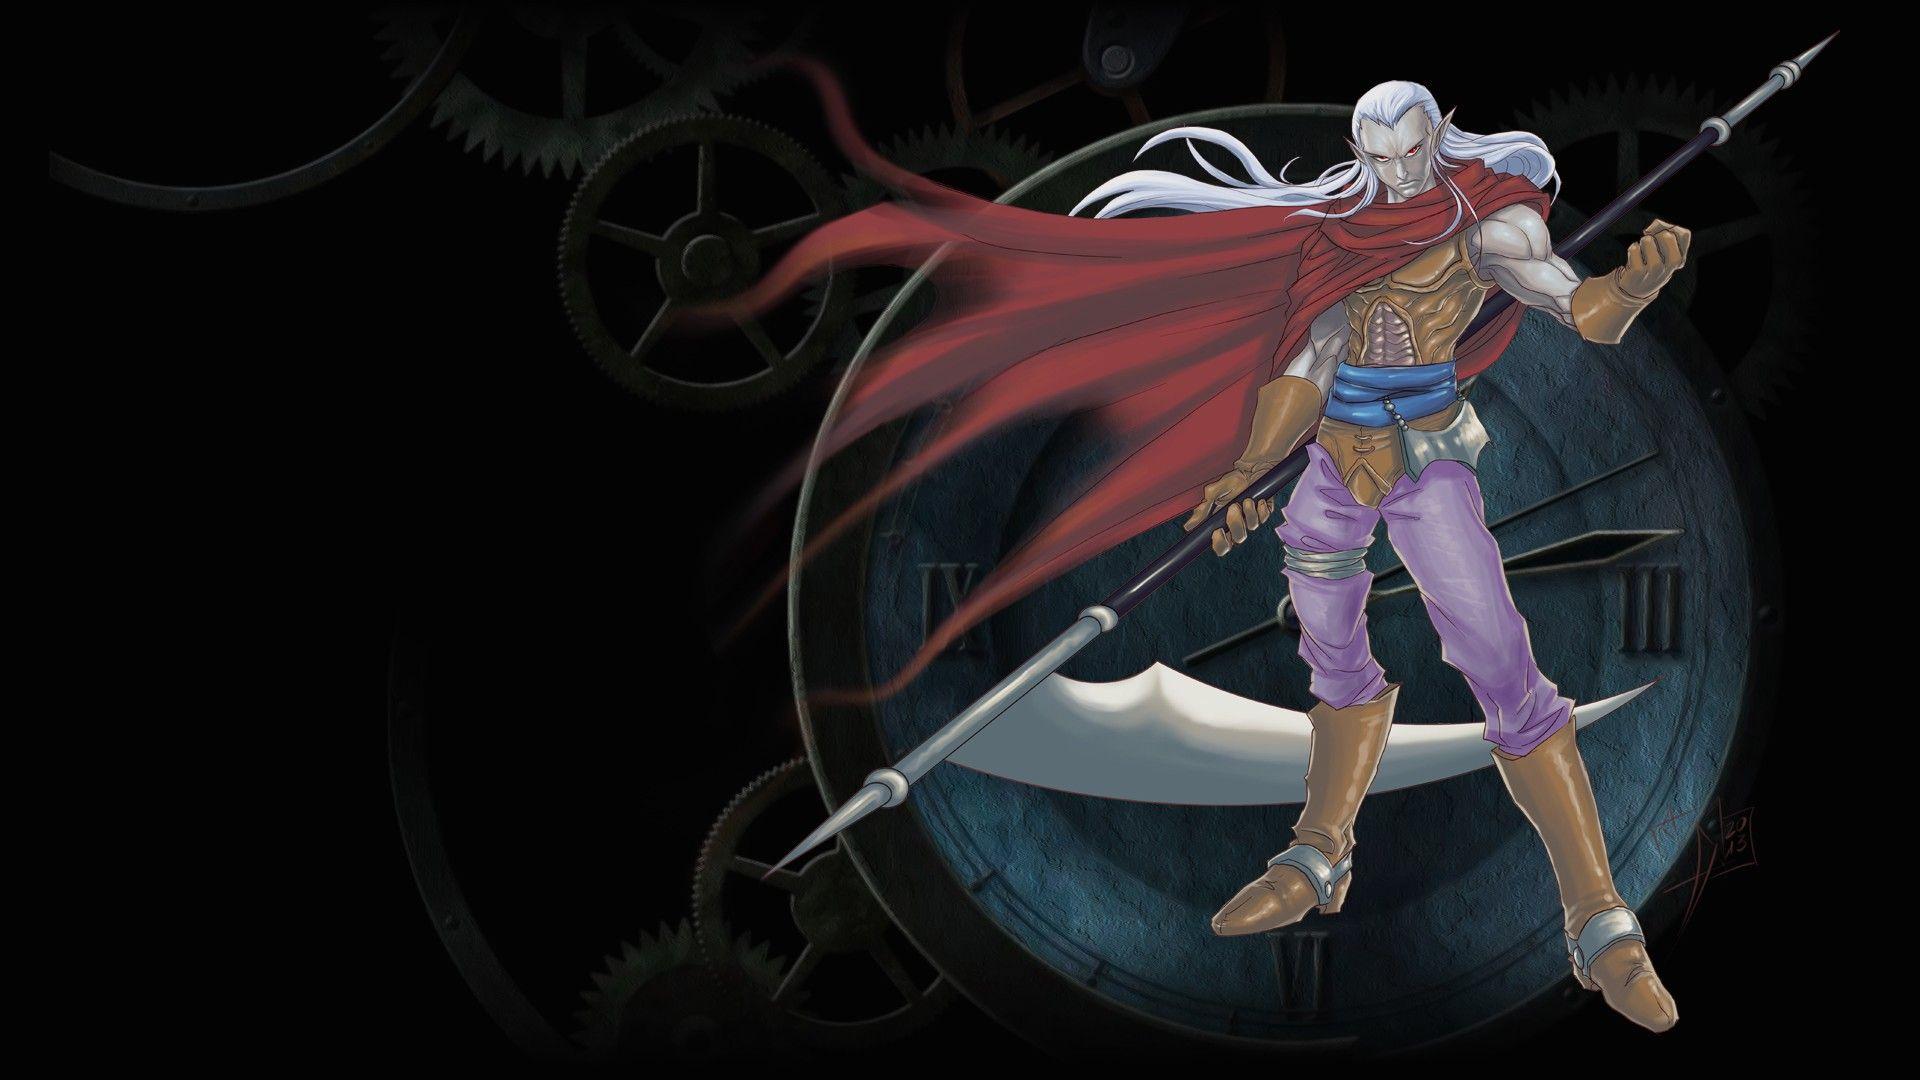 Video Game Chrono Trigger Wallpapers Desktop Phone Tablet Chrono Trigger Chrono Chrono Cross